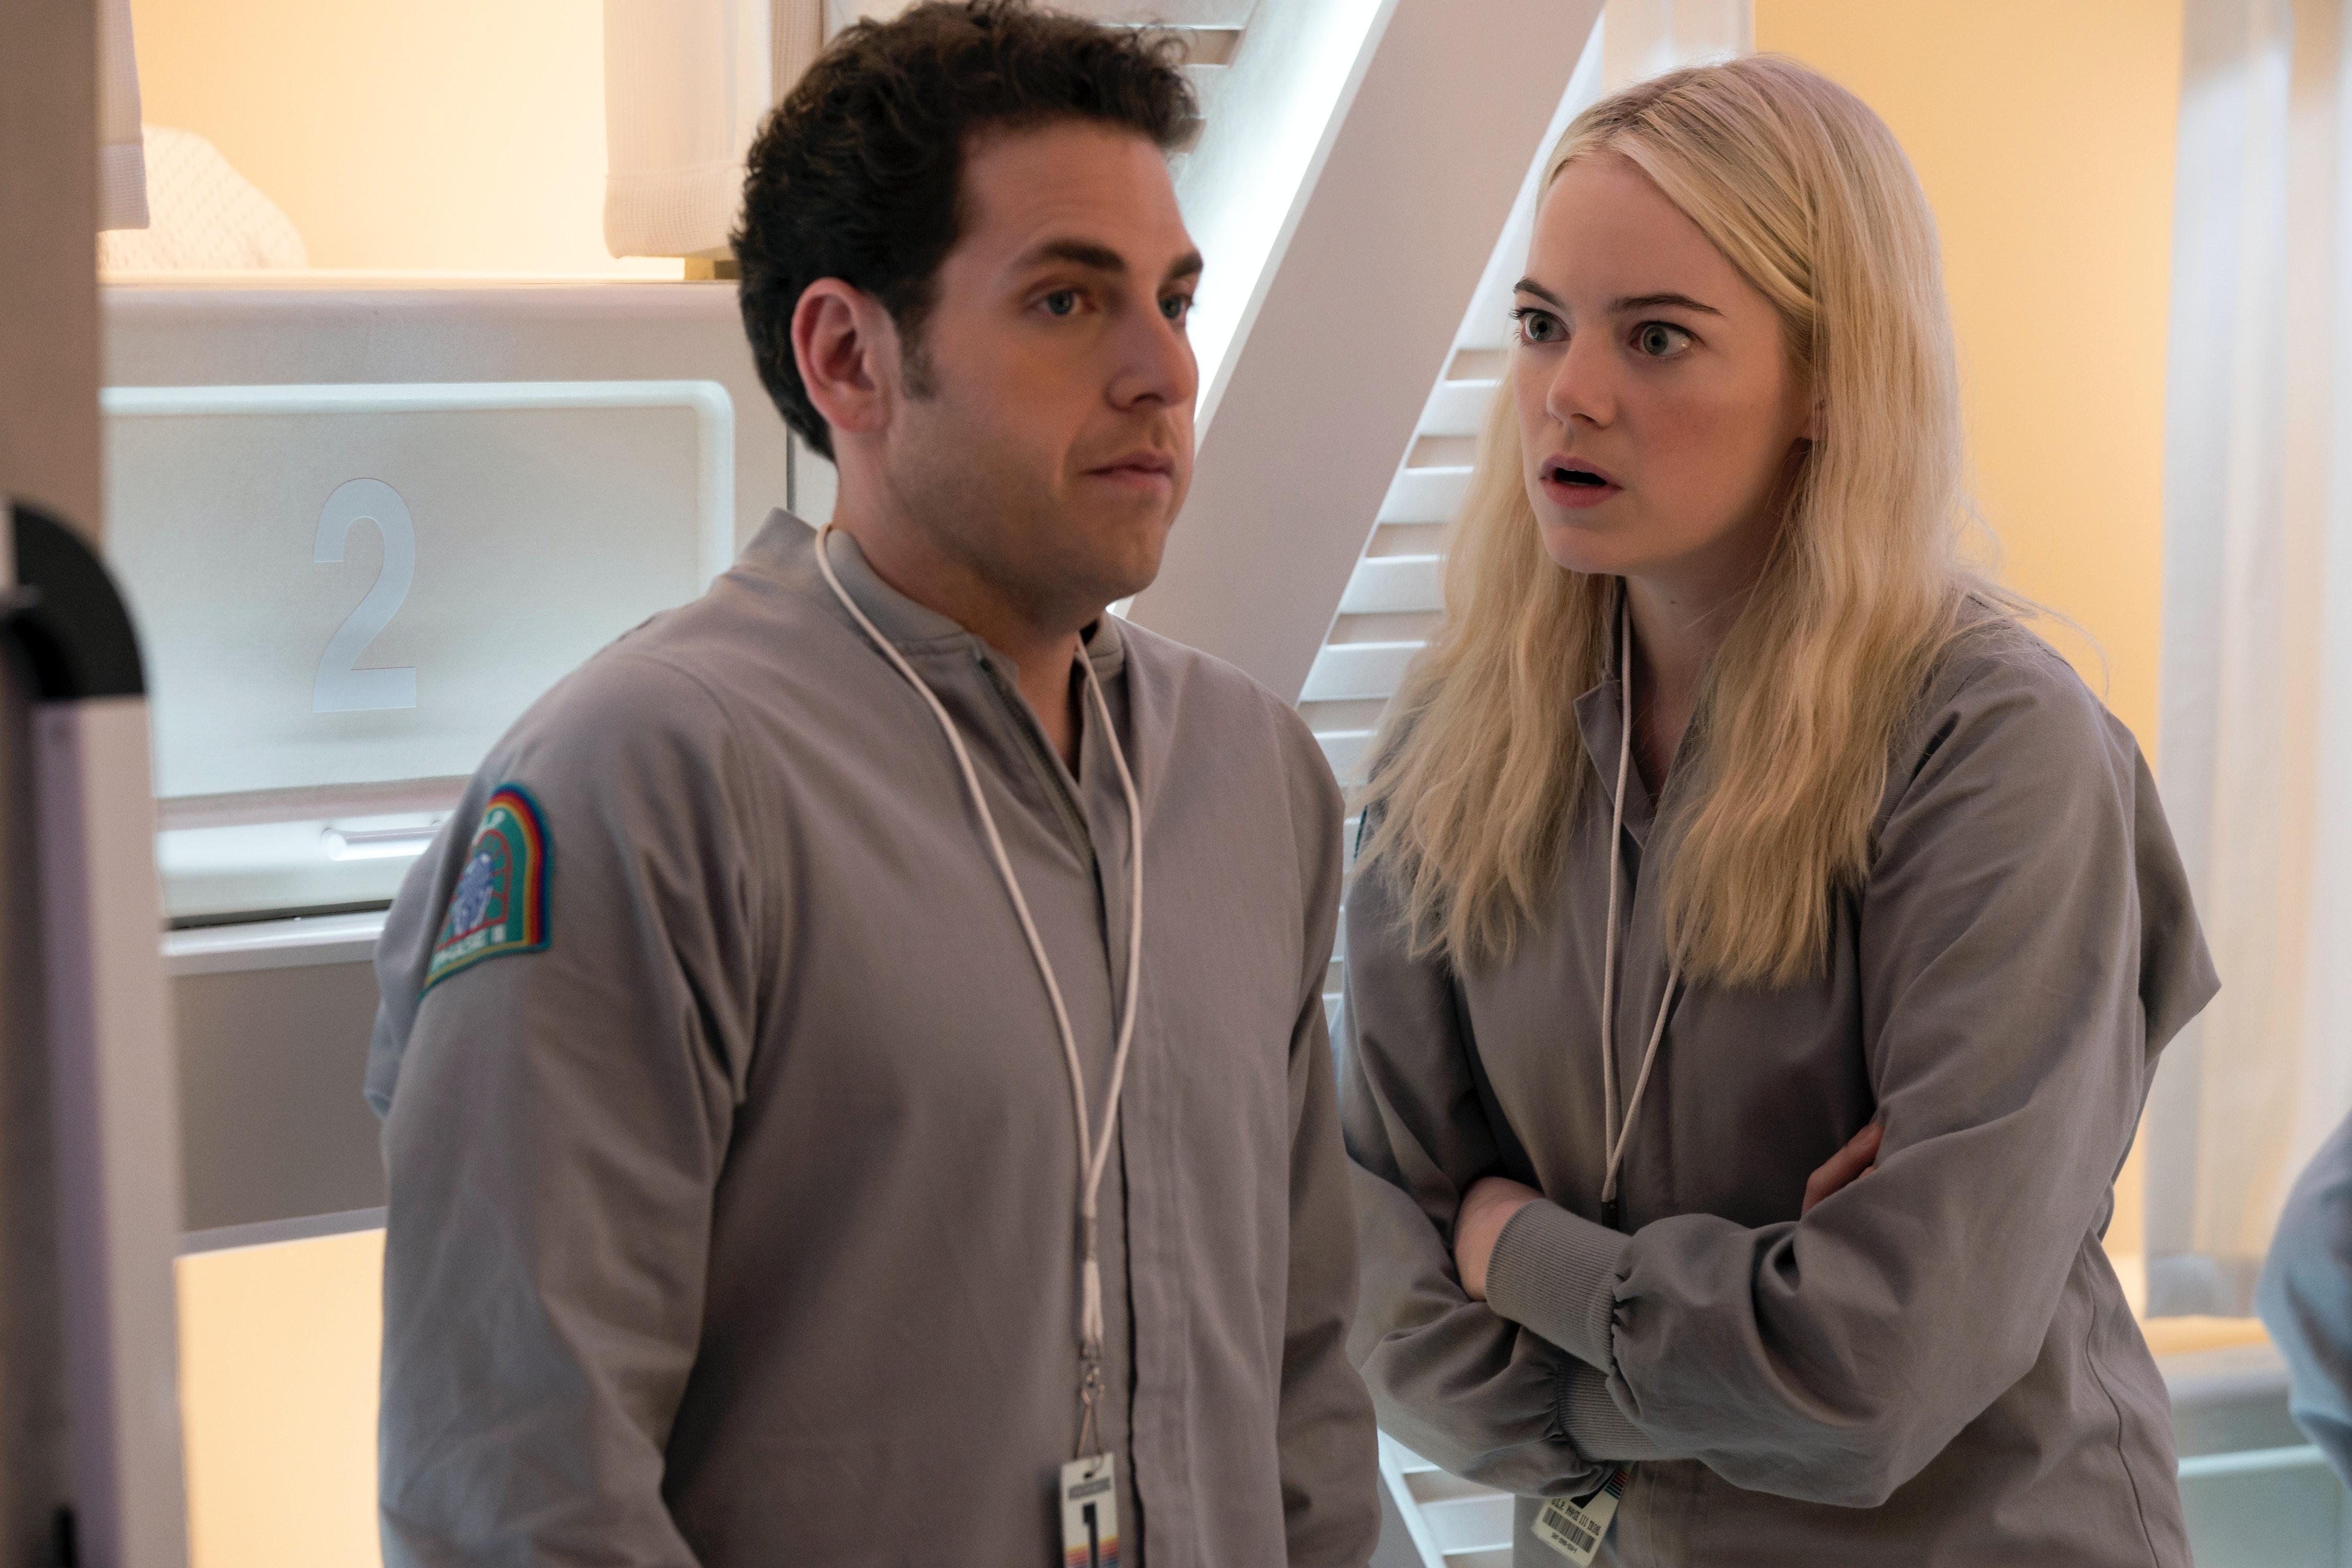 Will 'Maniac' Return For Season 2? The Netflix Sci-Fi Series